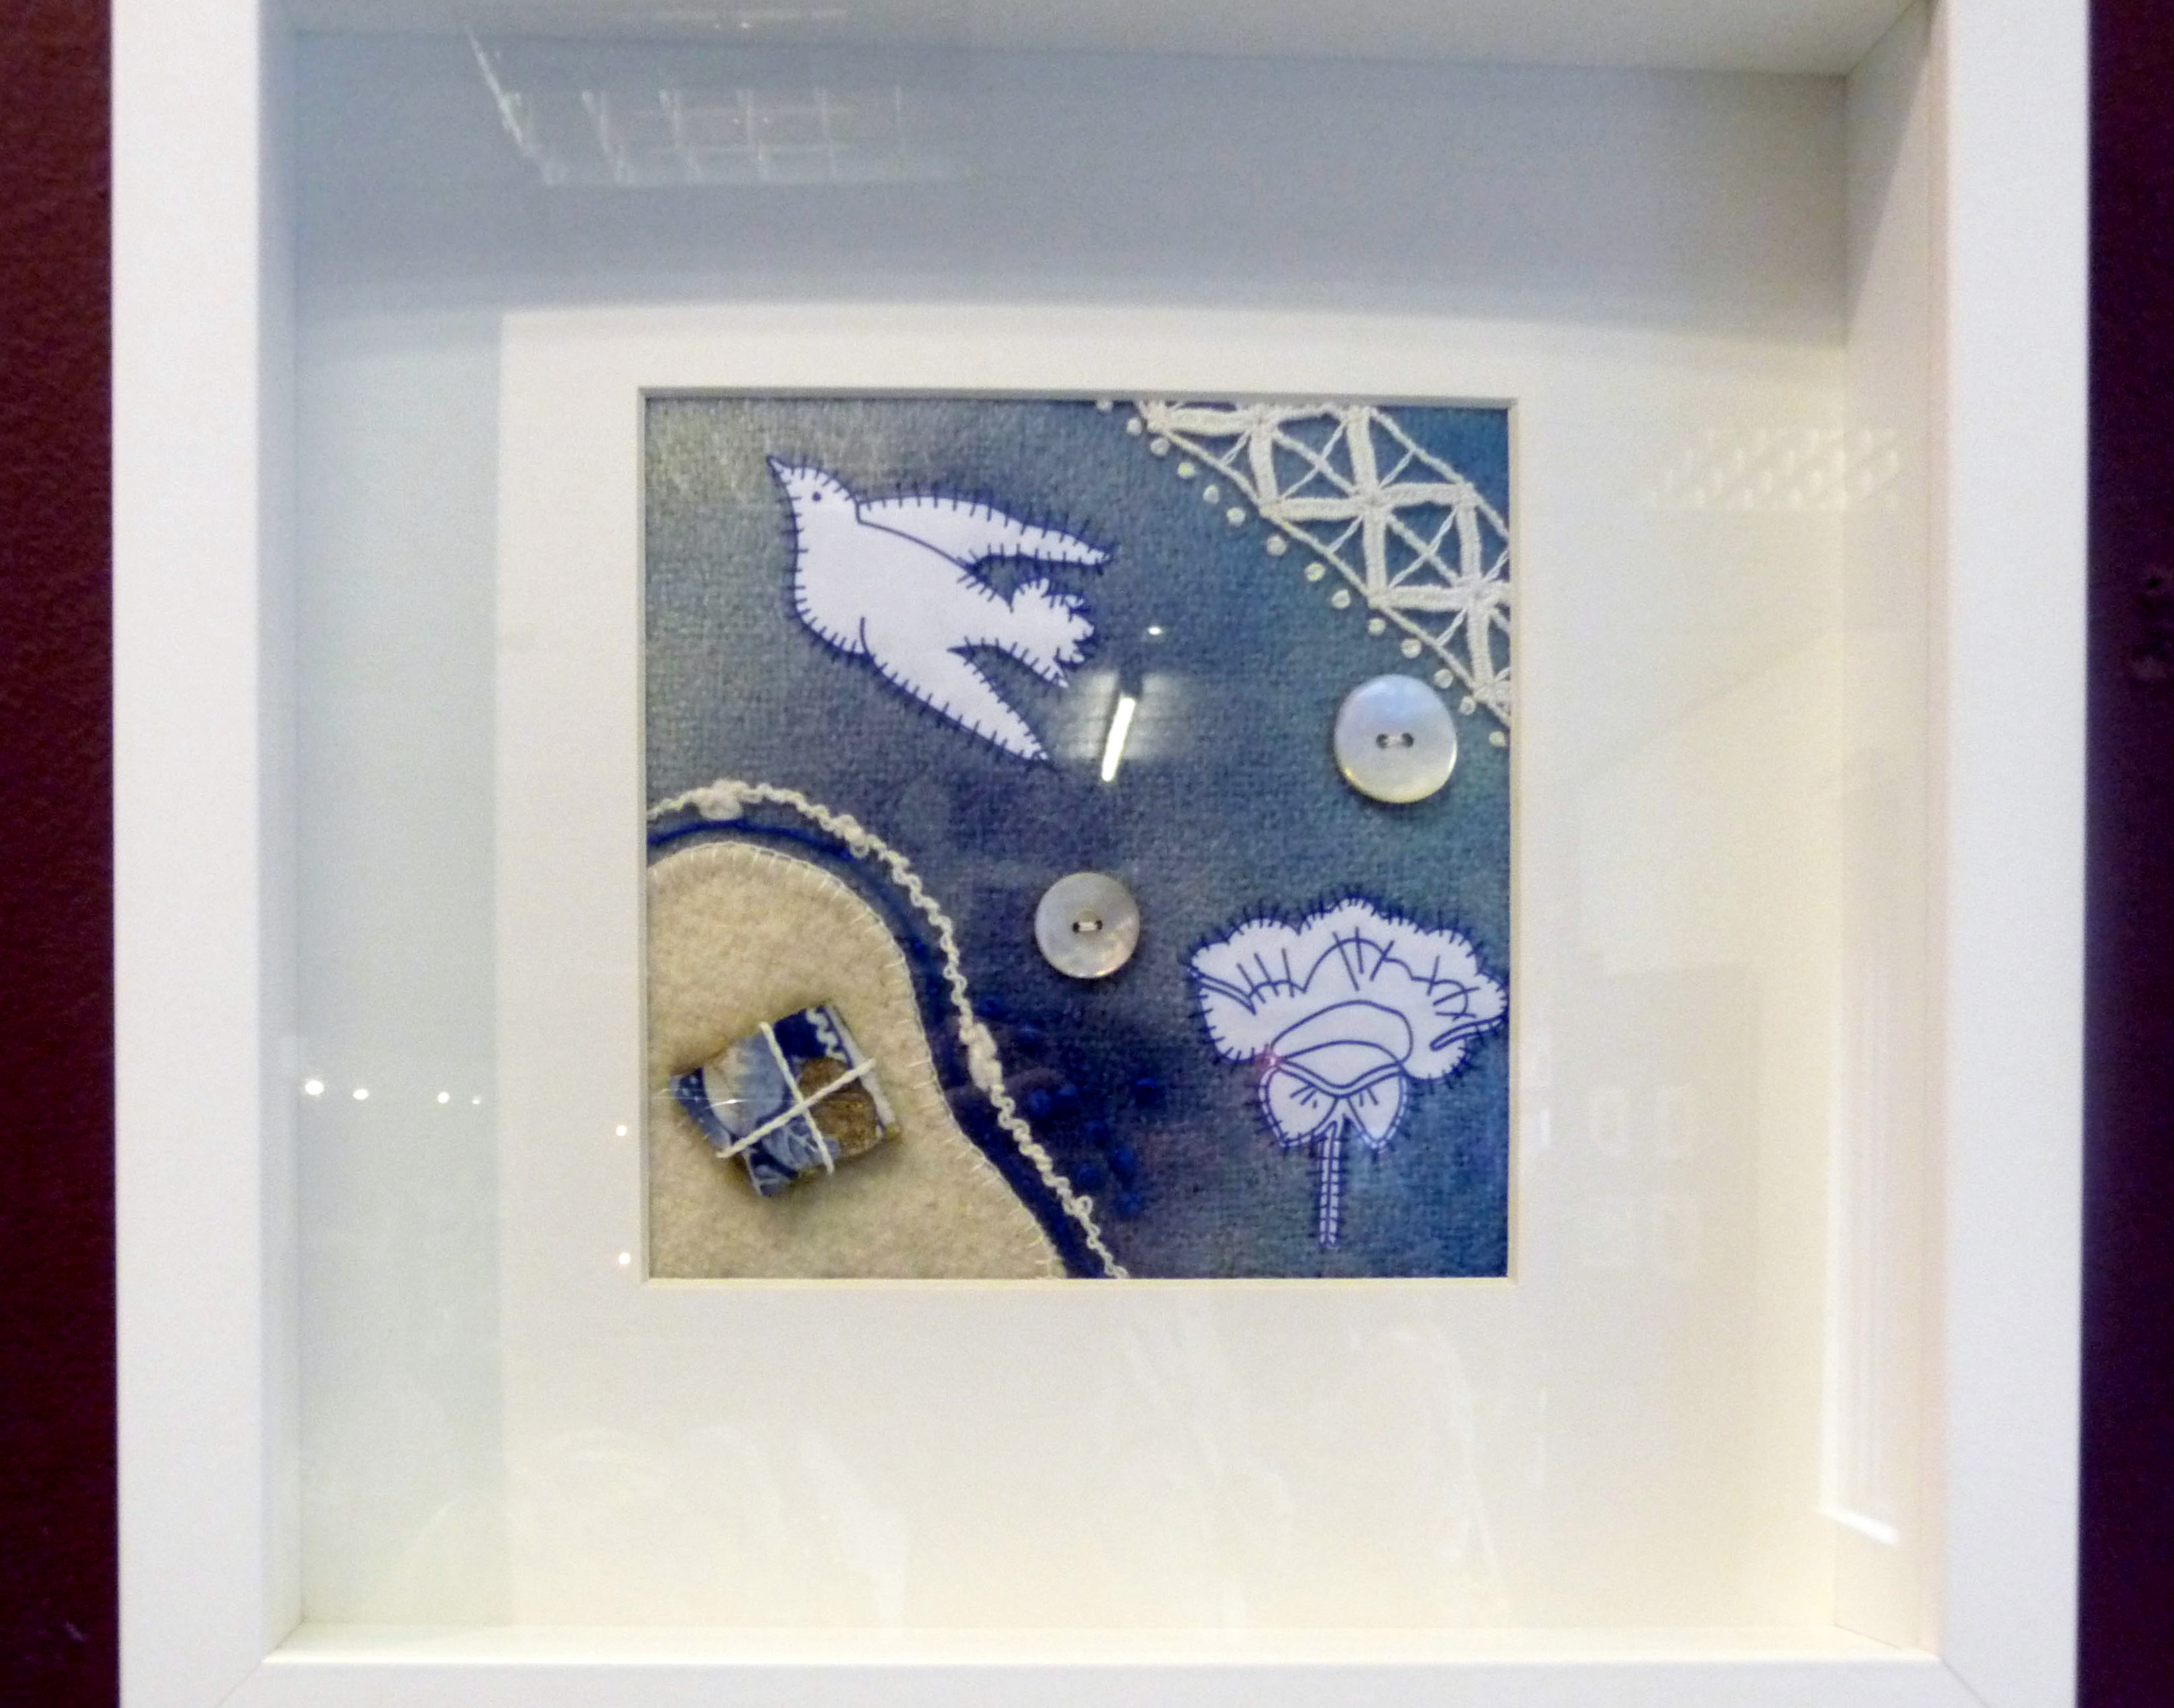 FRAGMENT 1 by Janet Wilkinson, hand stitch on blanket